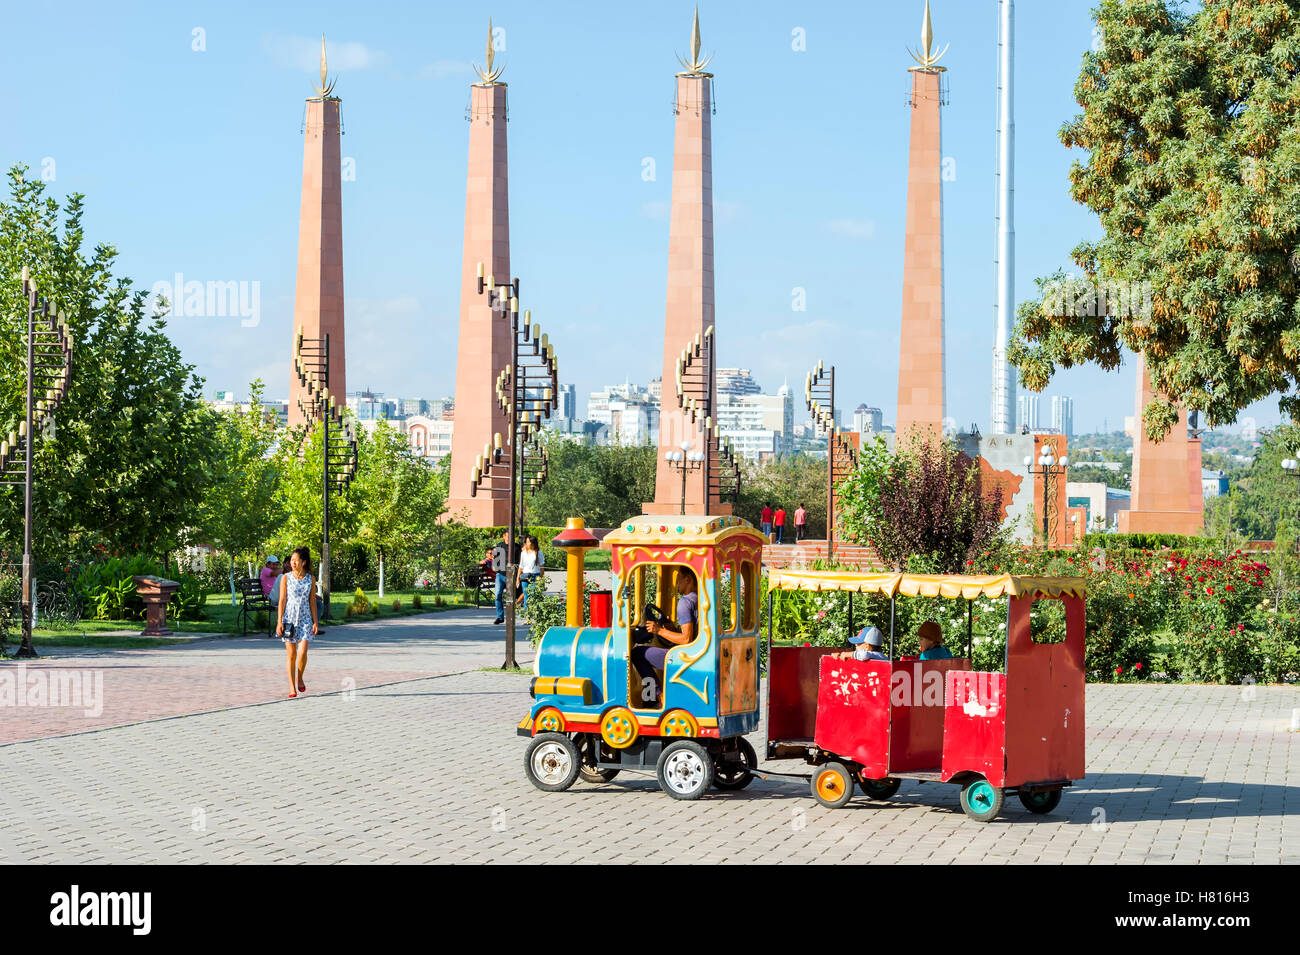 Granit obelisk and lamp post, Independence Park, Shymkent, South Region, Kazakhstan, Central Asia Stock Photo